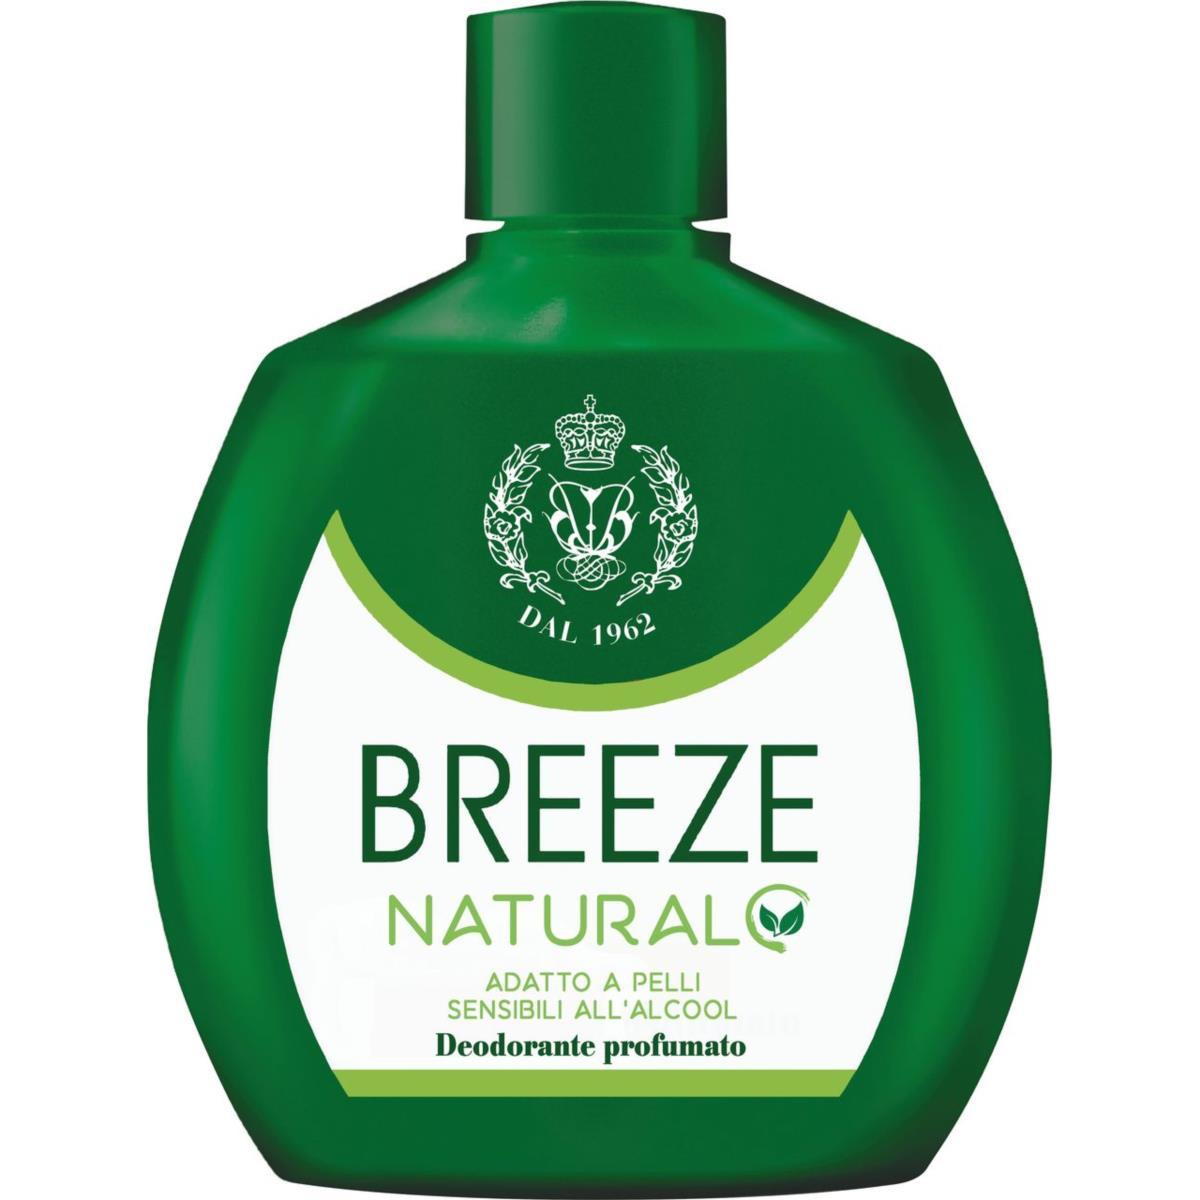 Breeze Natural essence Deodorante profumato 100 ml